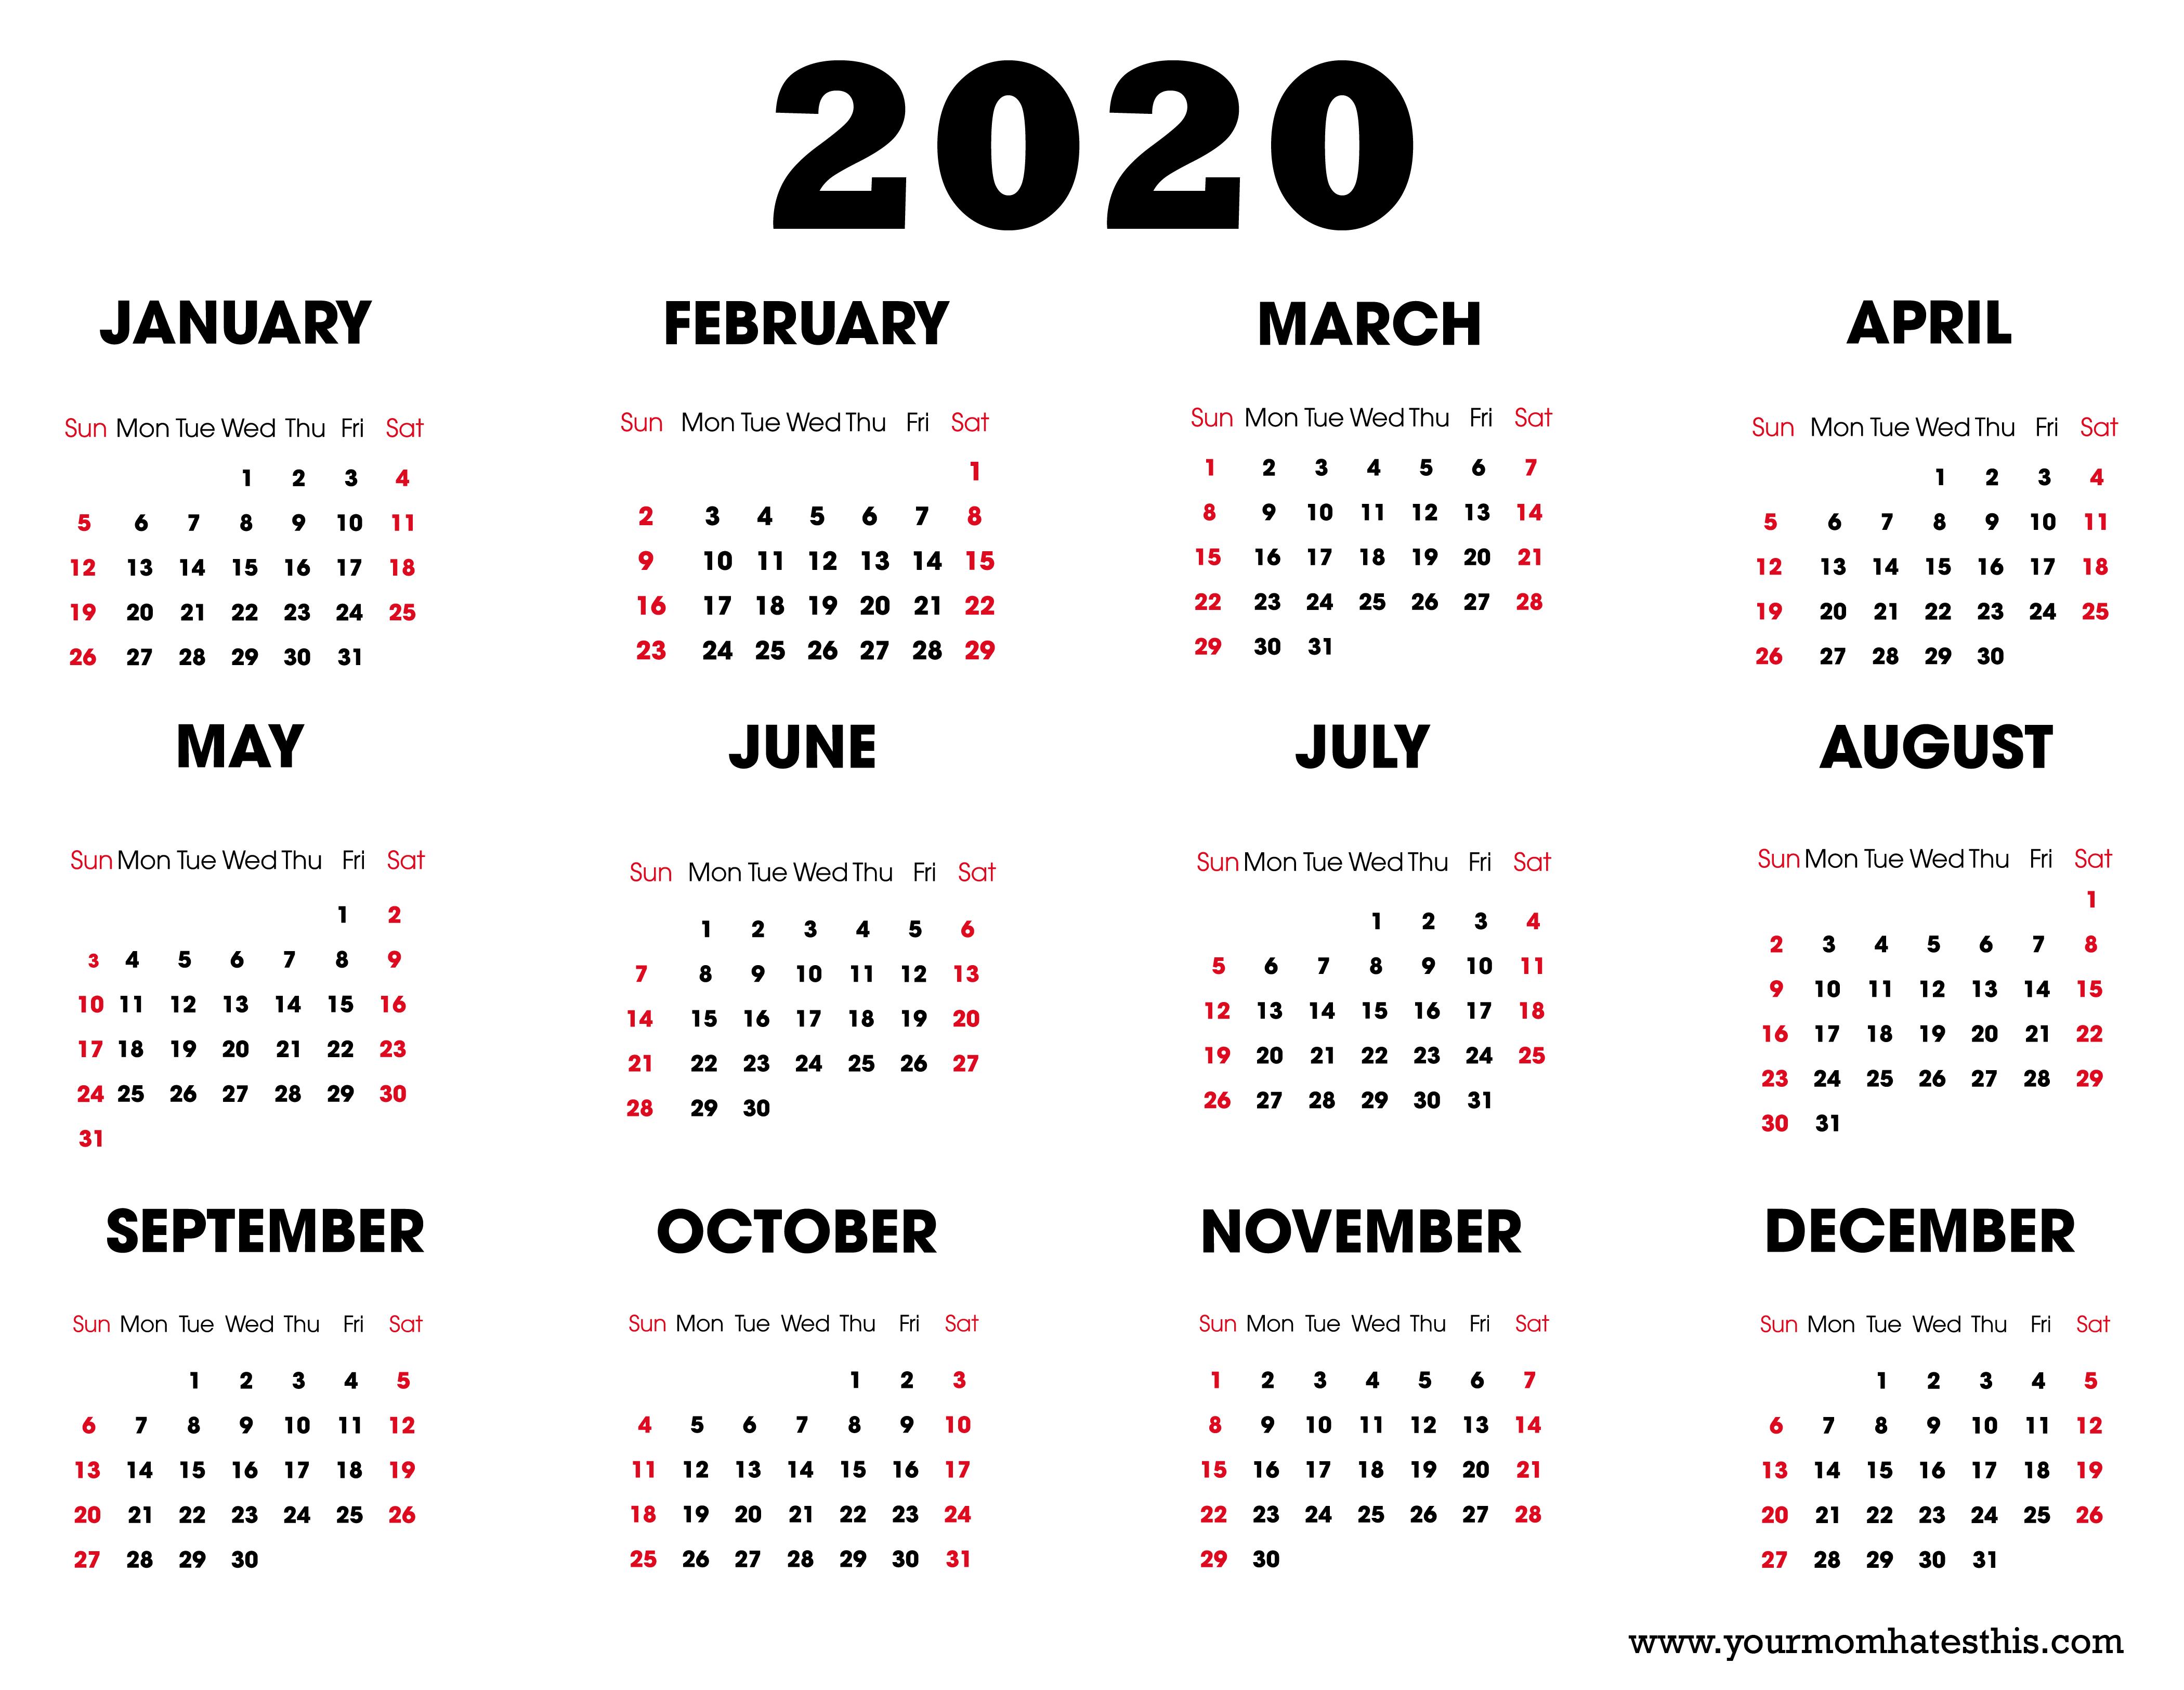 Free 2020 Printable Calendar - Create Editable Yearly